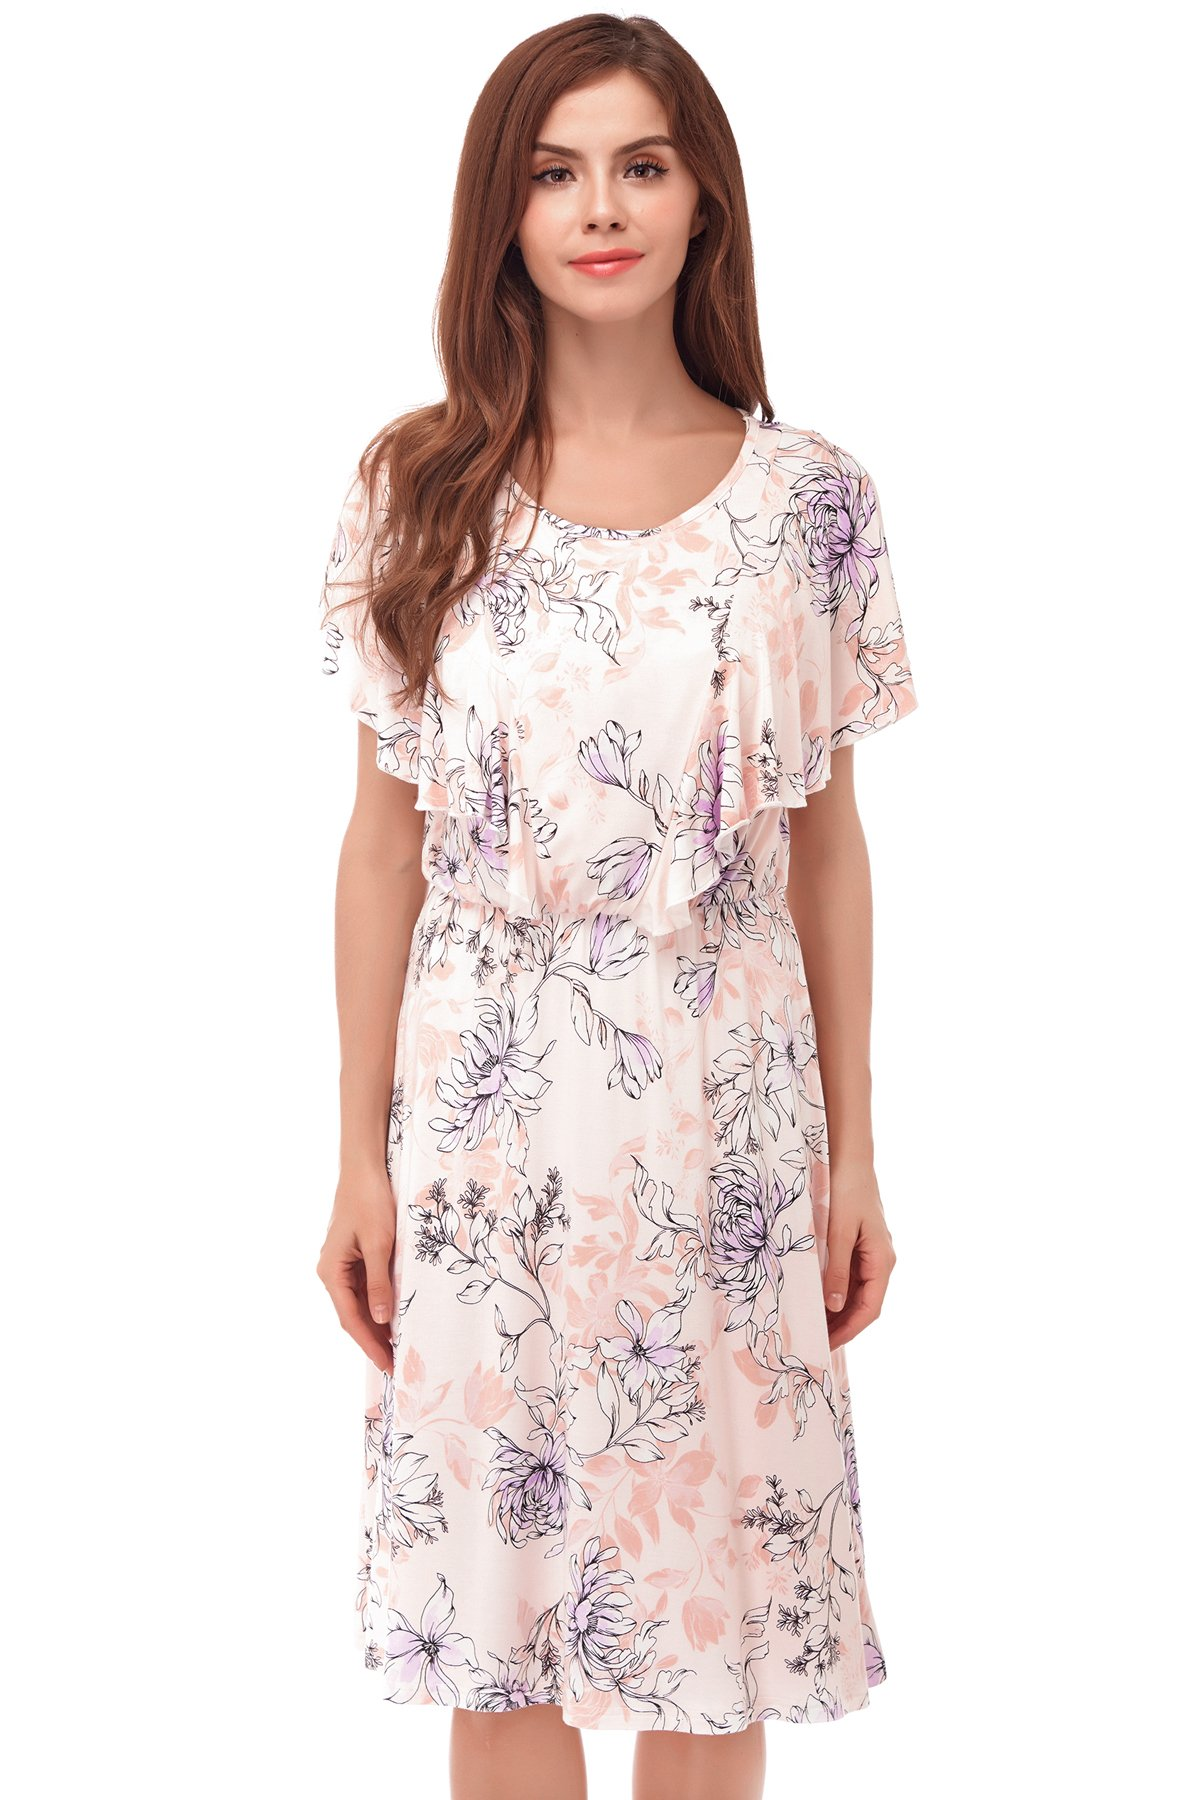 Bearsland Women's Summer Floral Cloak Design Maternity Breastfeeding Dress Nursing Dress,pinkflower,Large